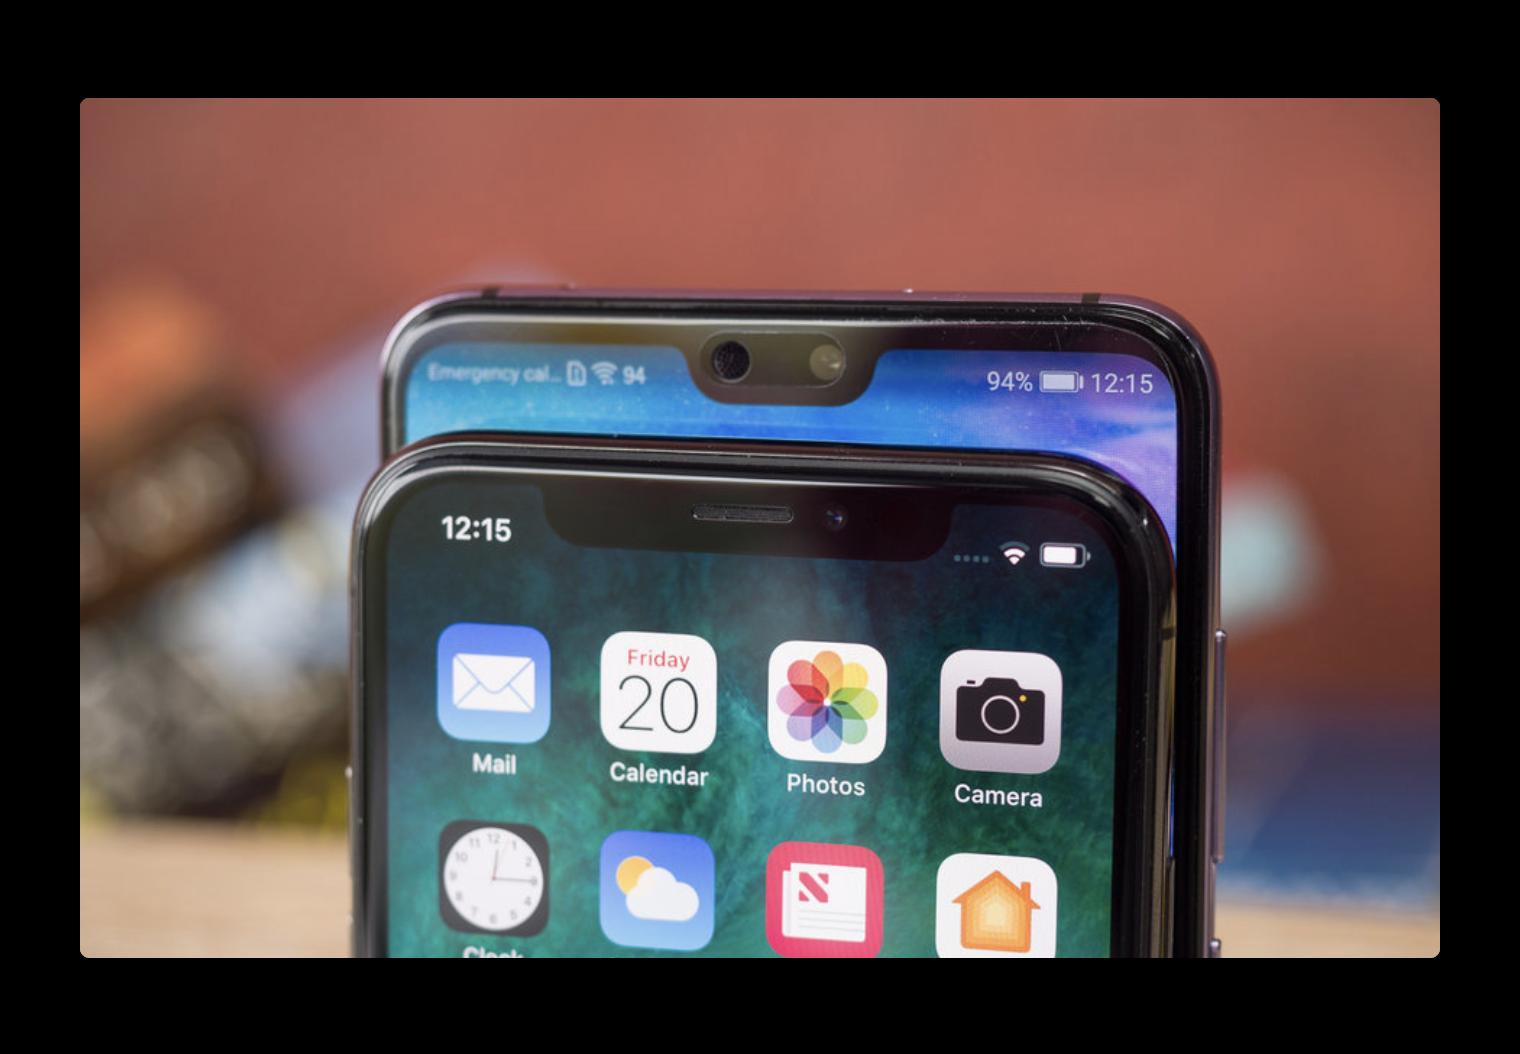 Huaweiは2018年第3四半期に中国を独占し、Appleは収益の面で主導